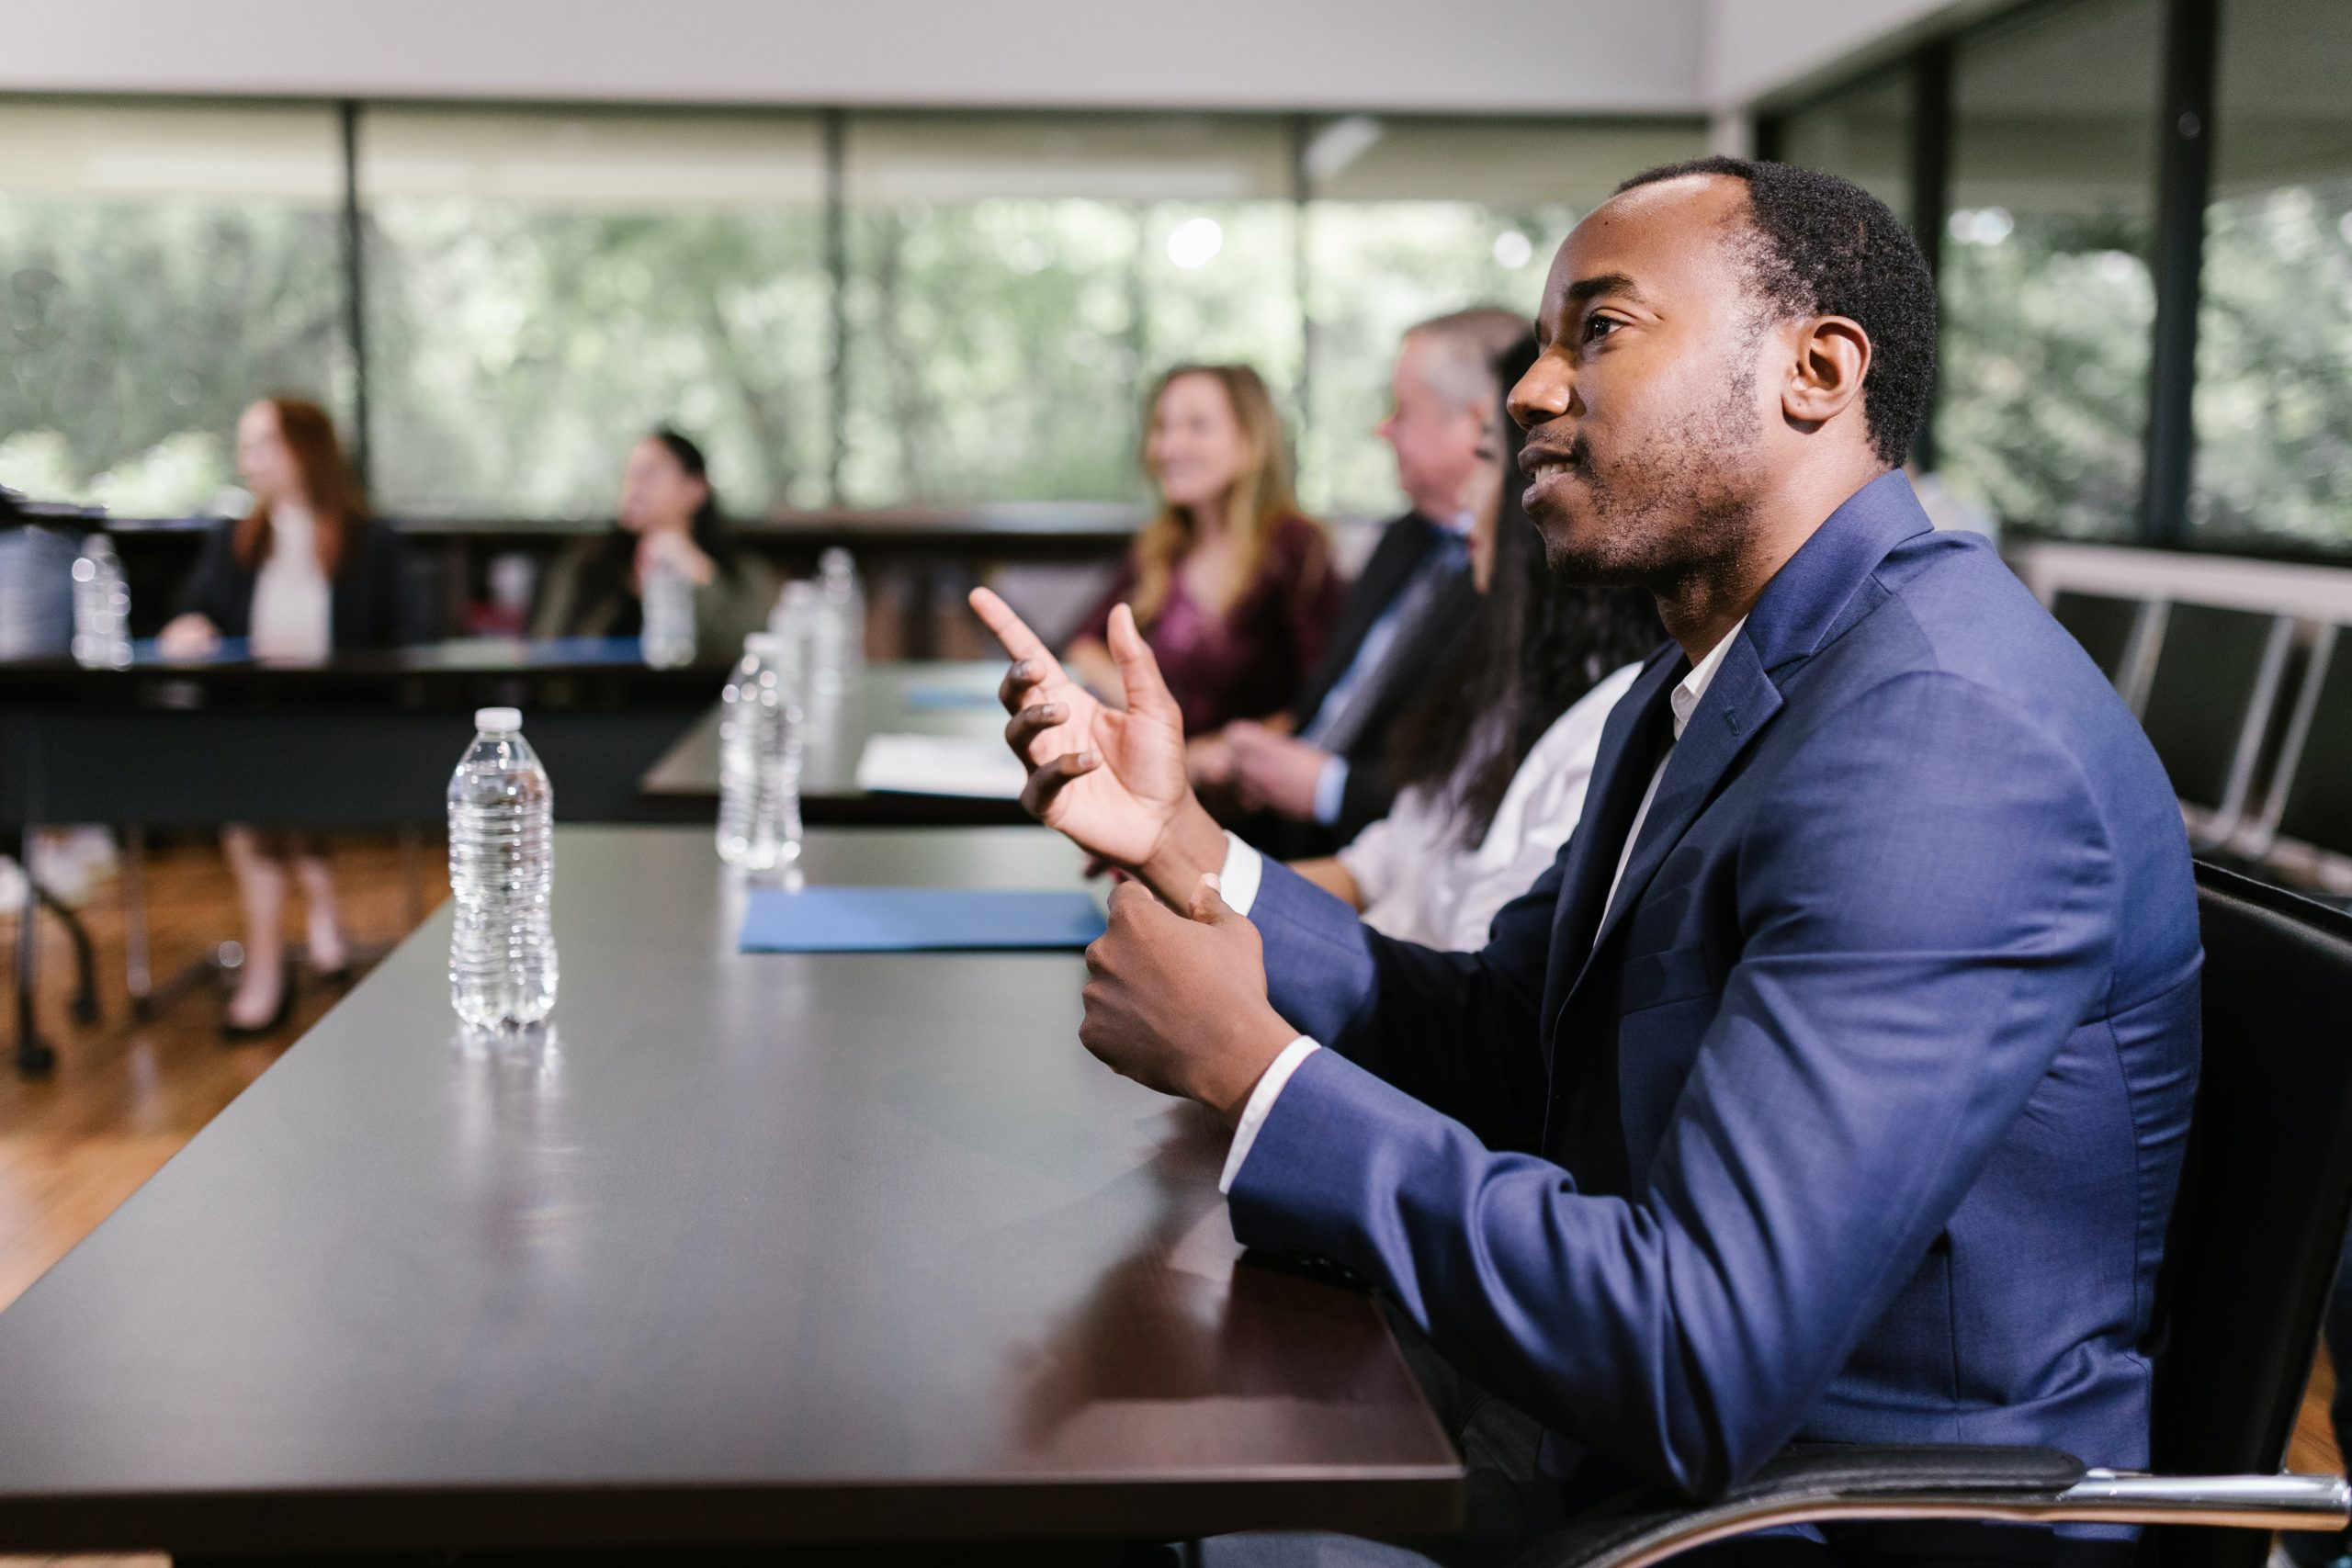 how to run an effective meeting: ahern, murphy, and associates